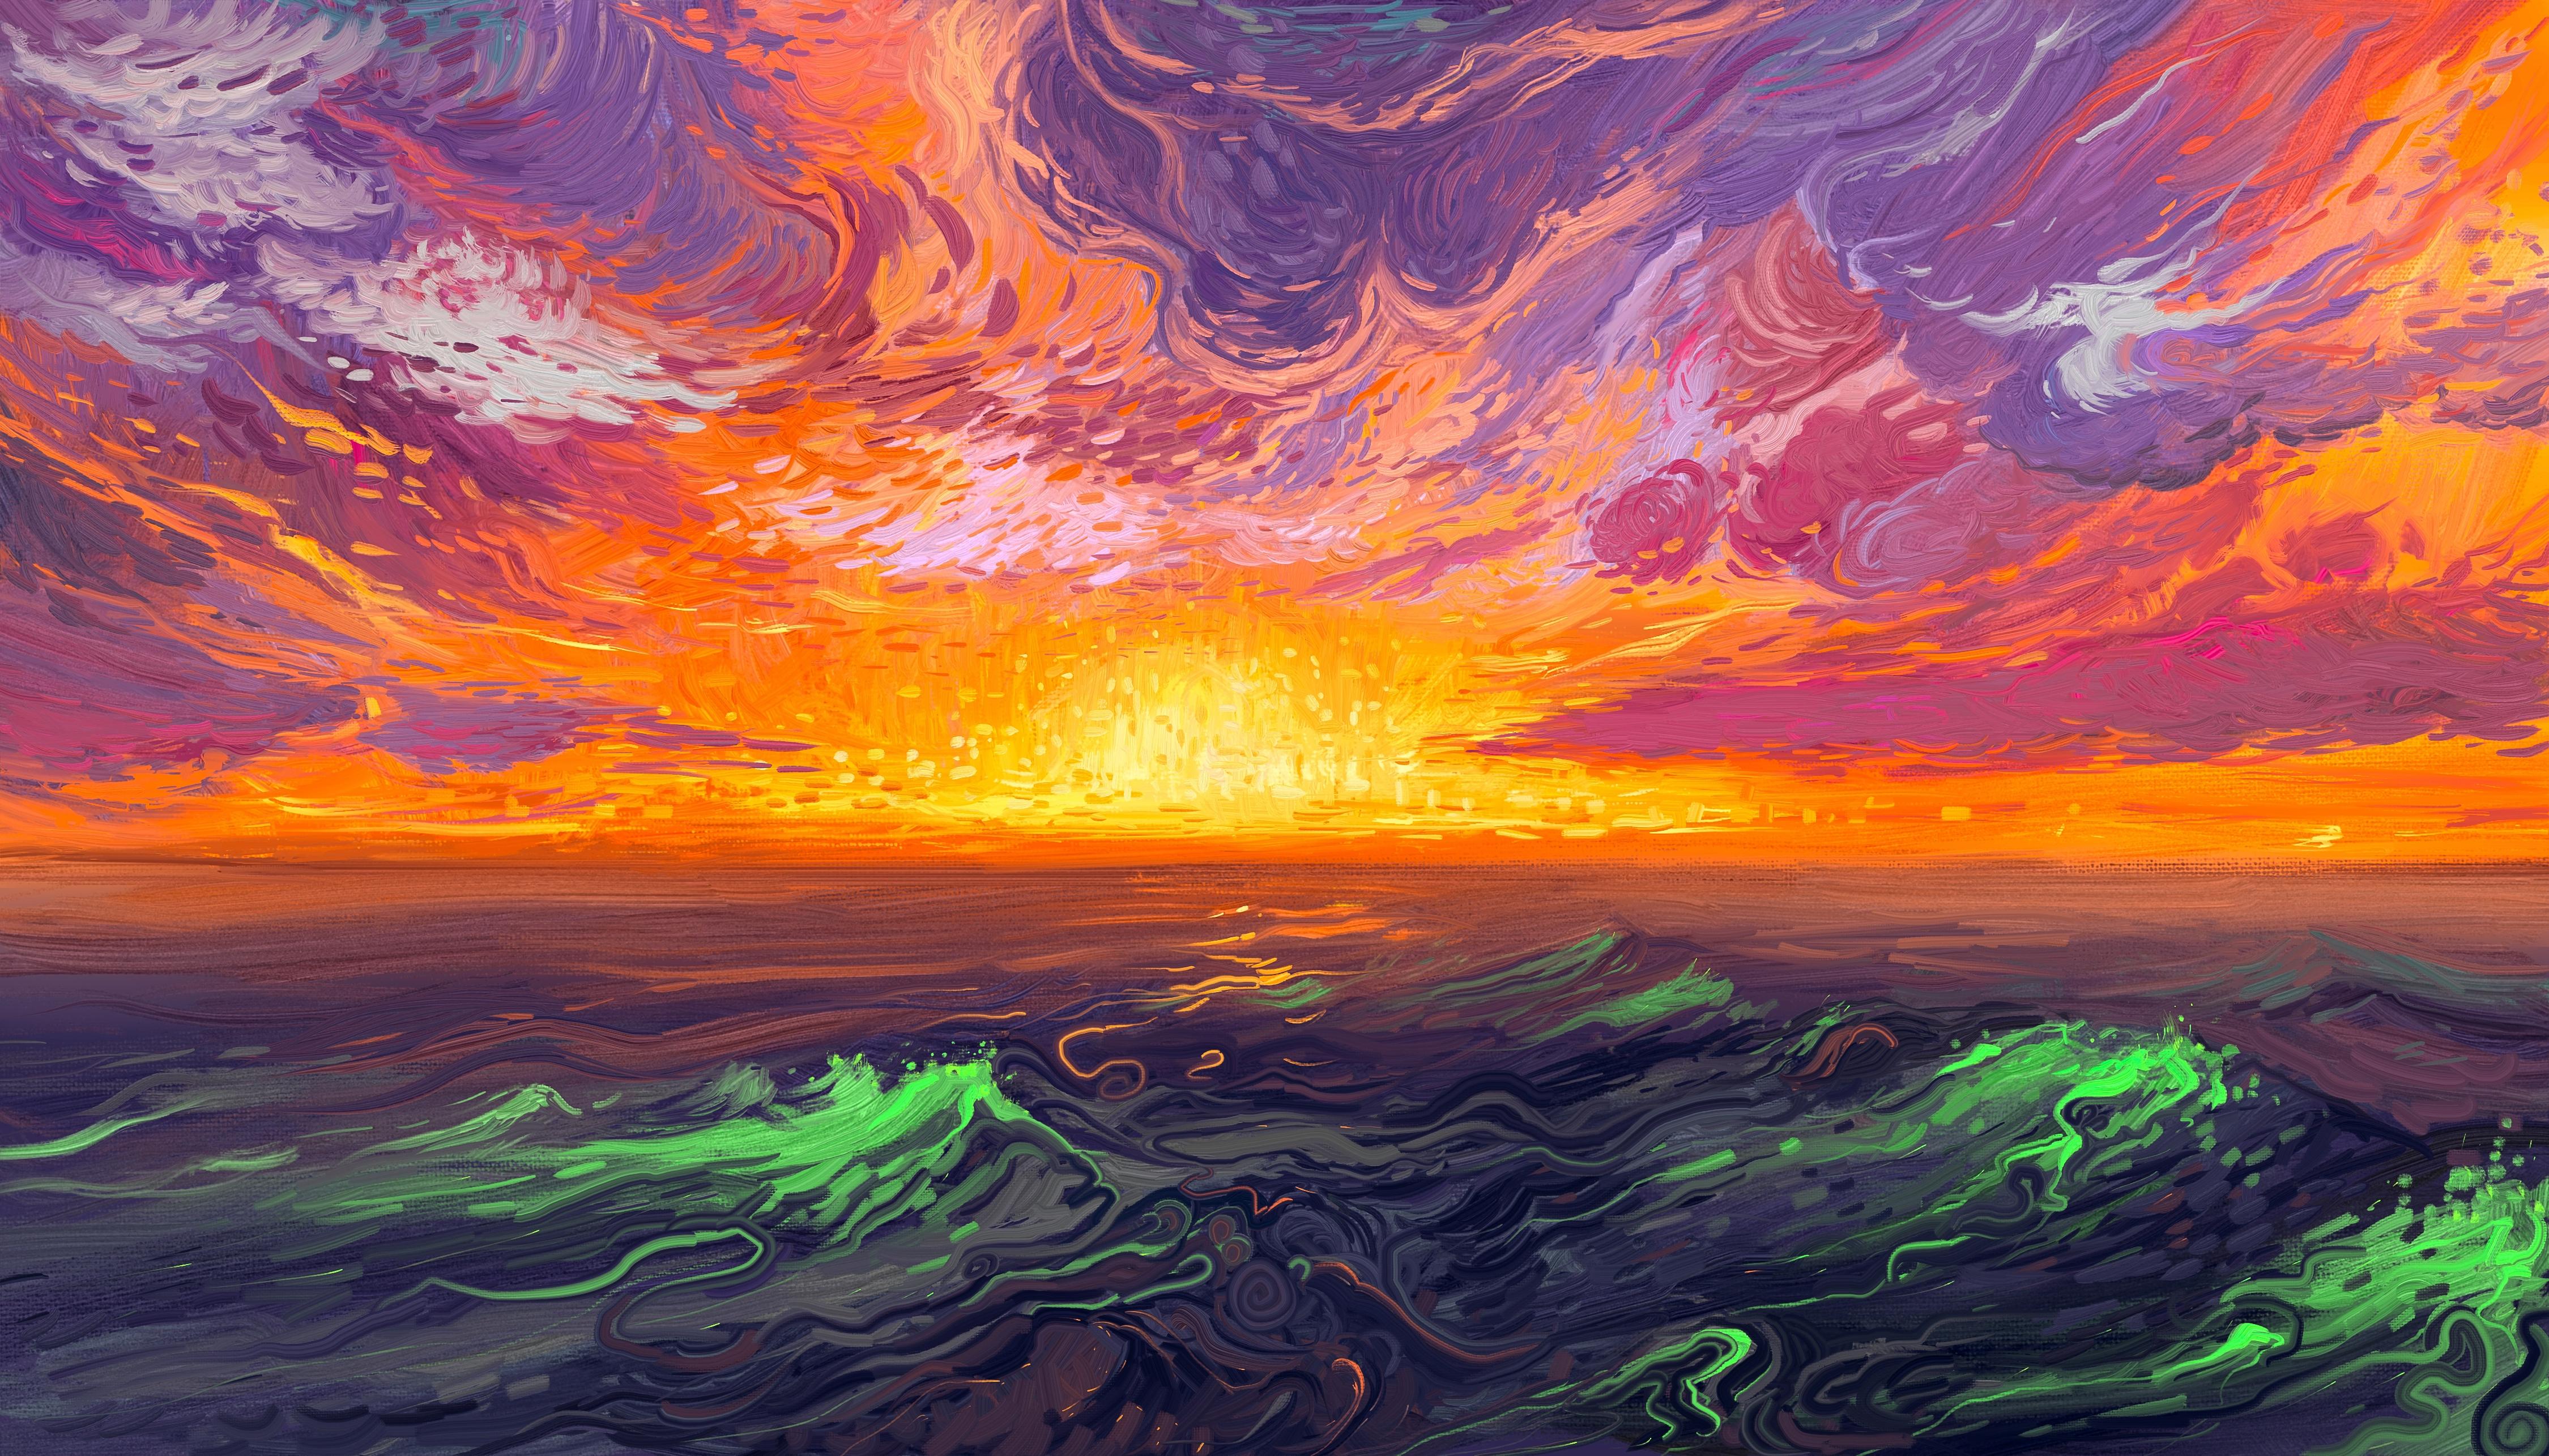 General 4500x2571 Hangmoon digital art painting sunrise waves sea